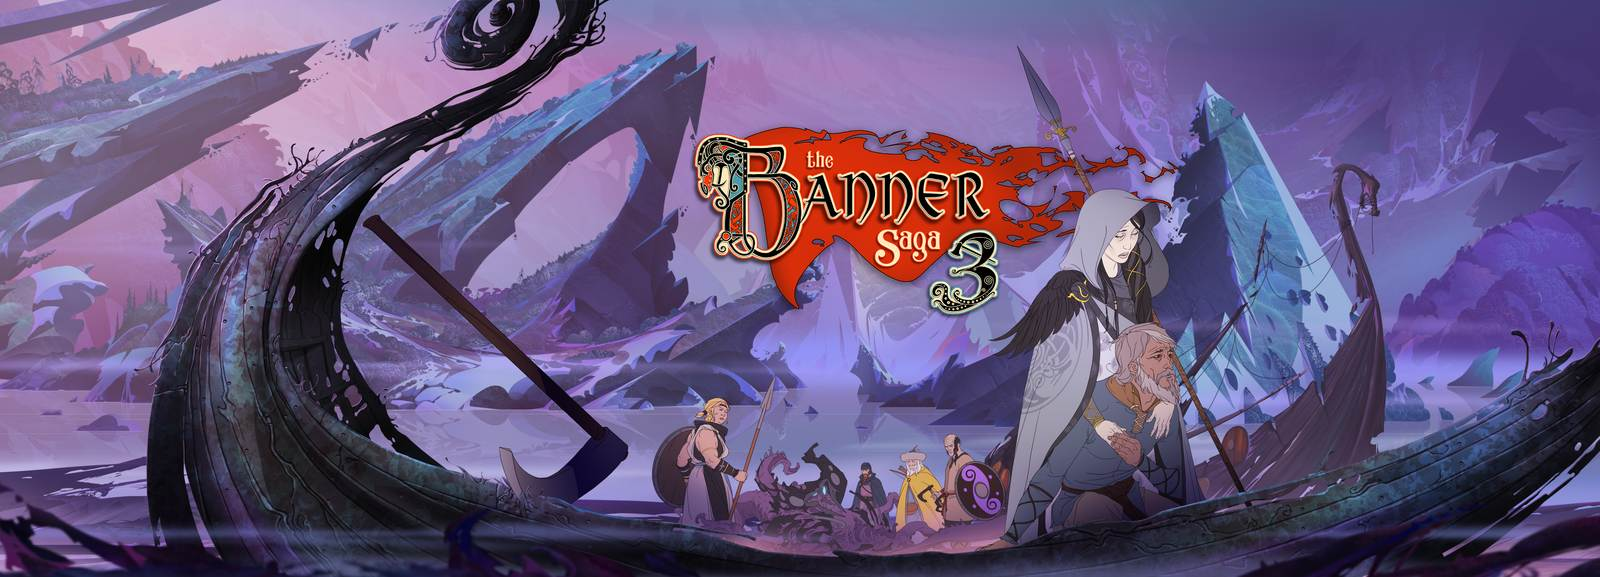 The Banner Saga 3 – Recensione